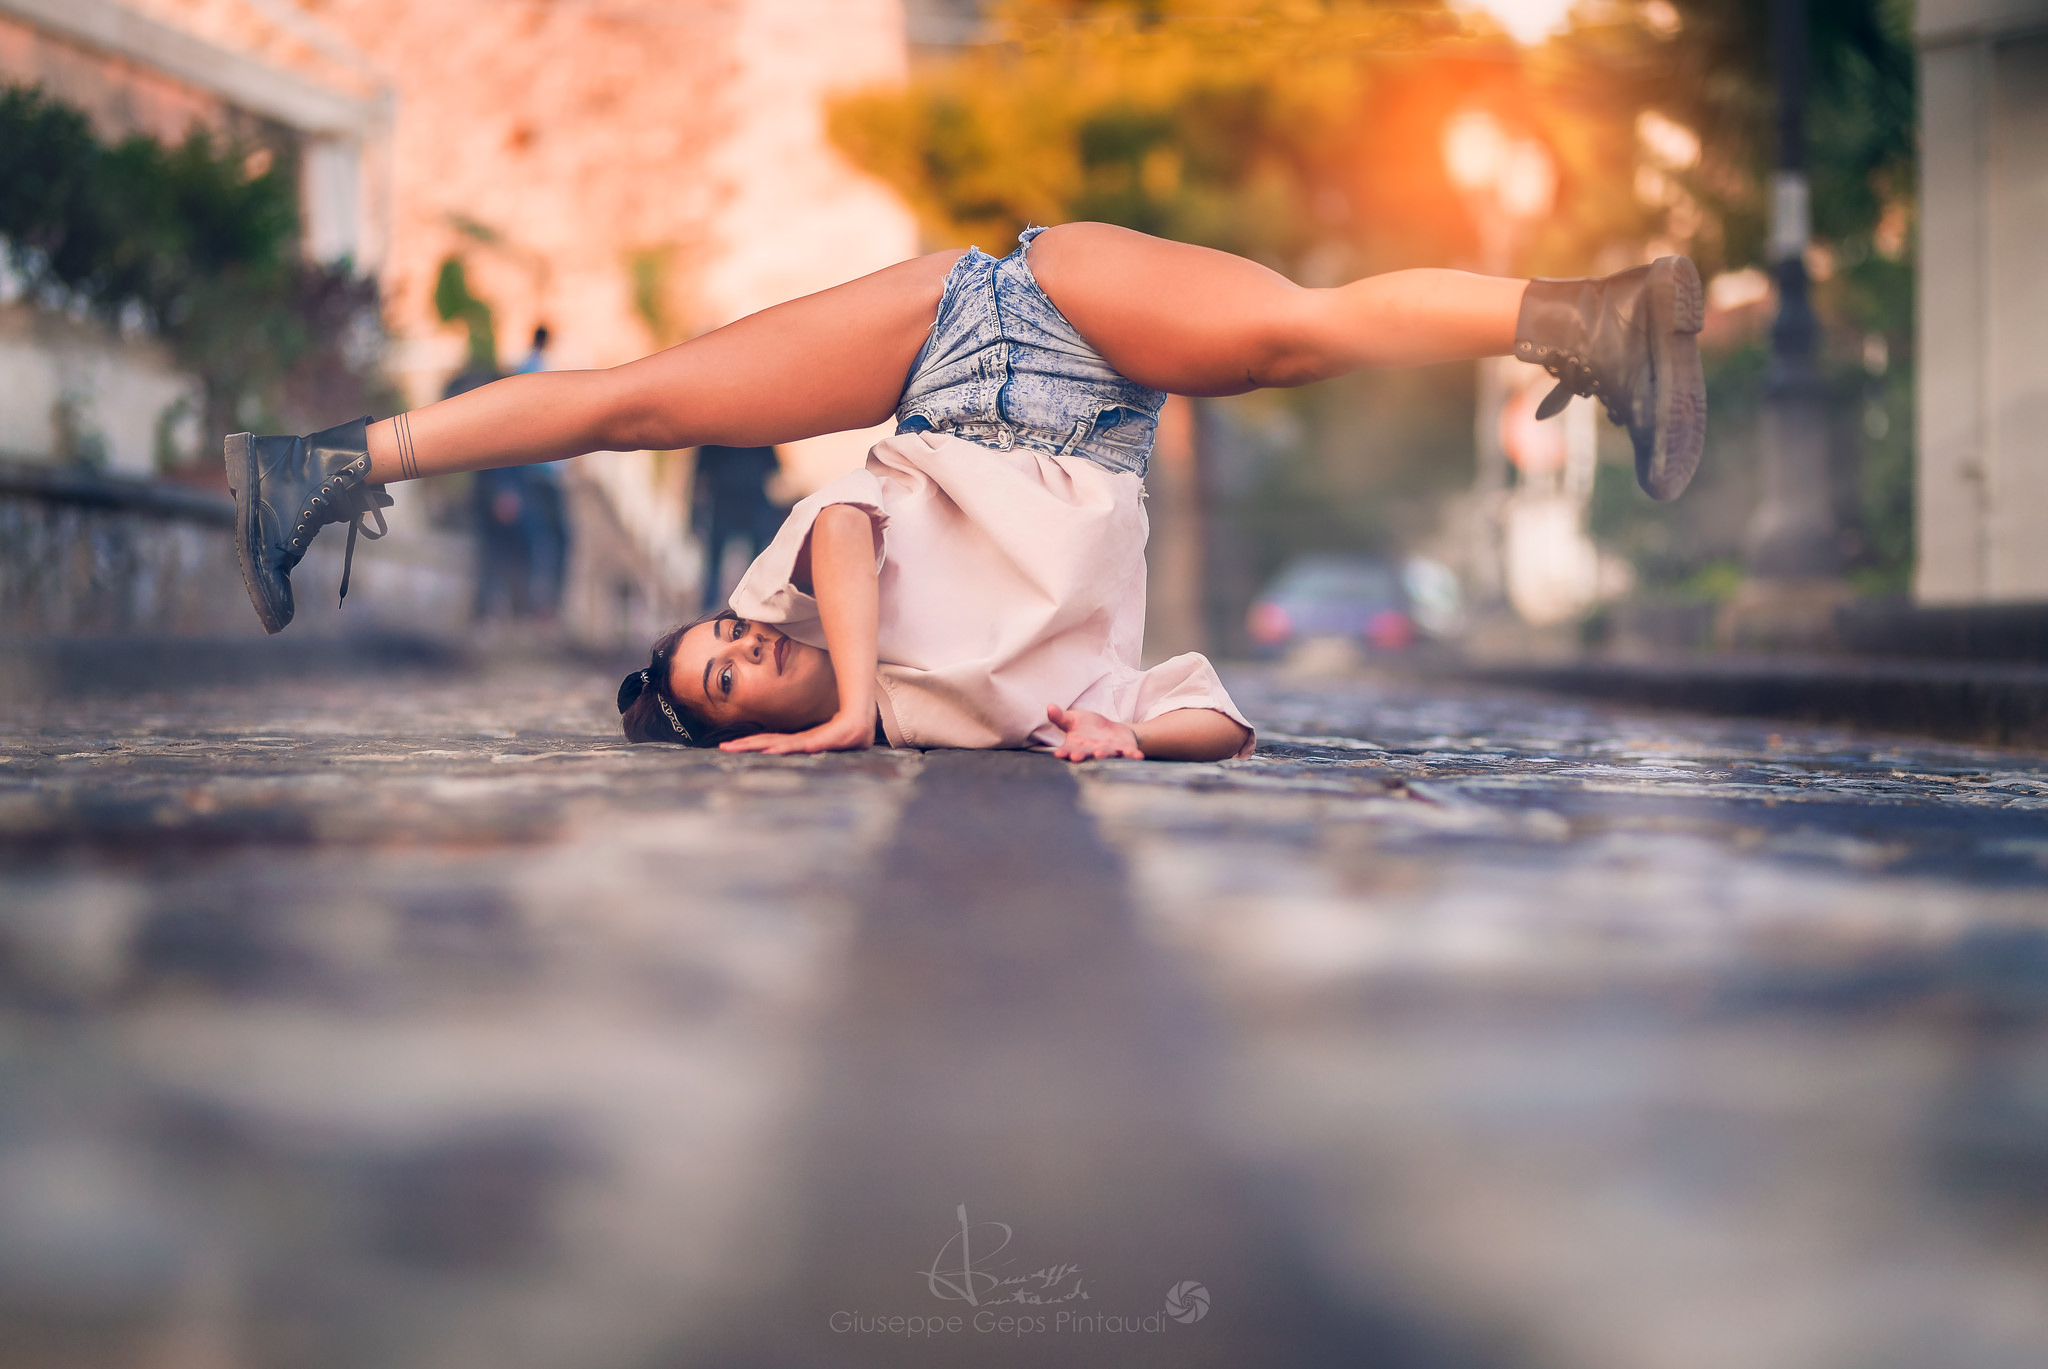 Urban Dancer...